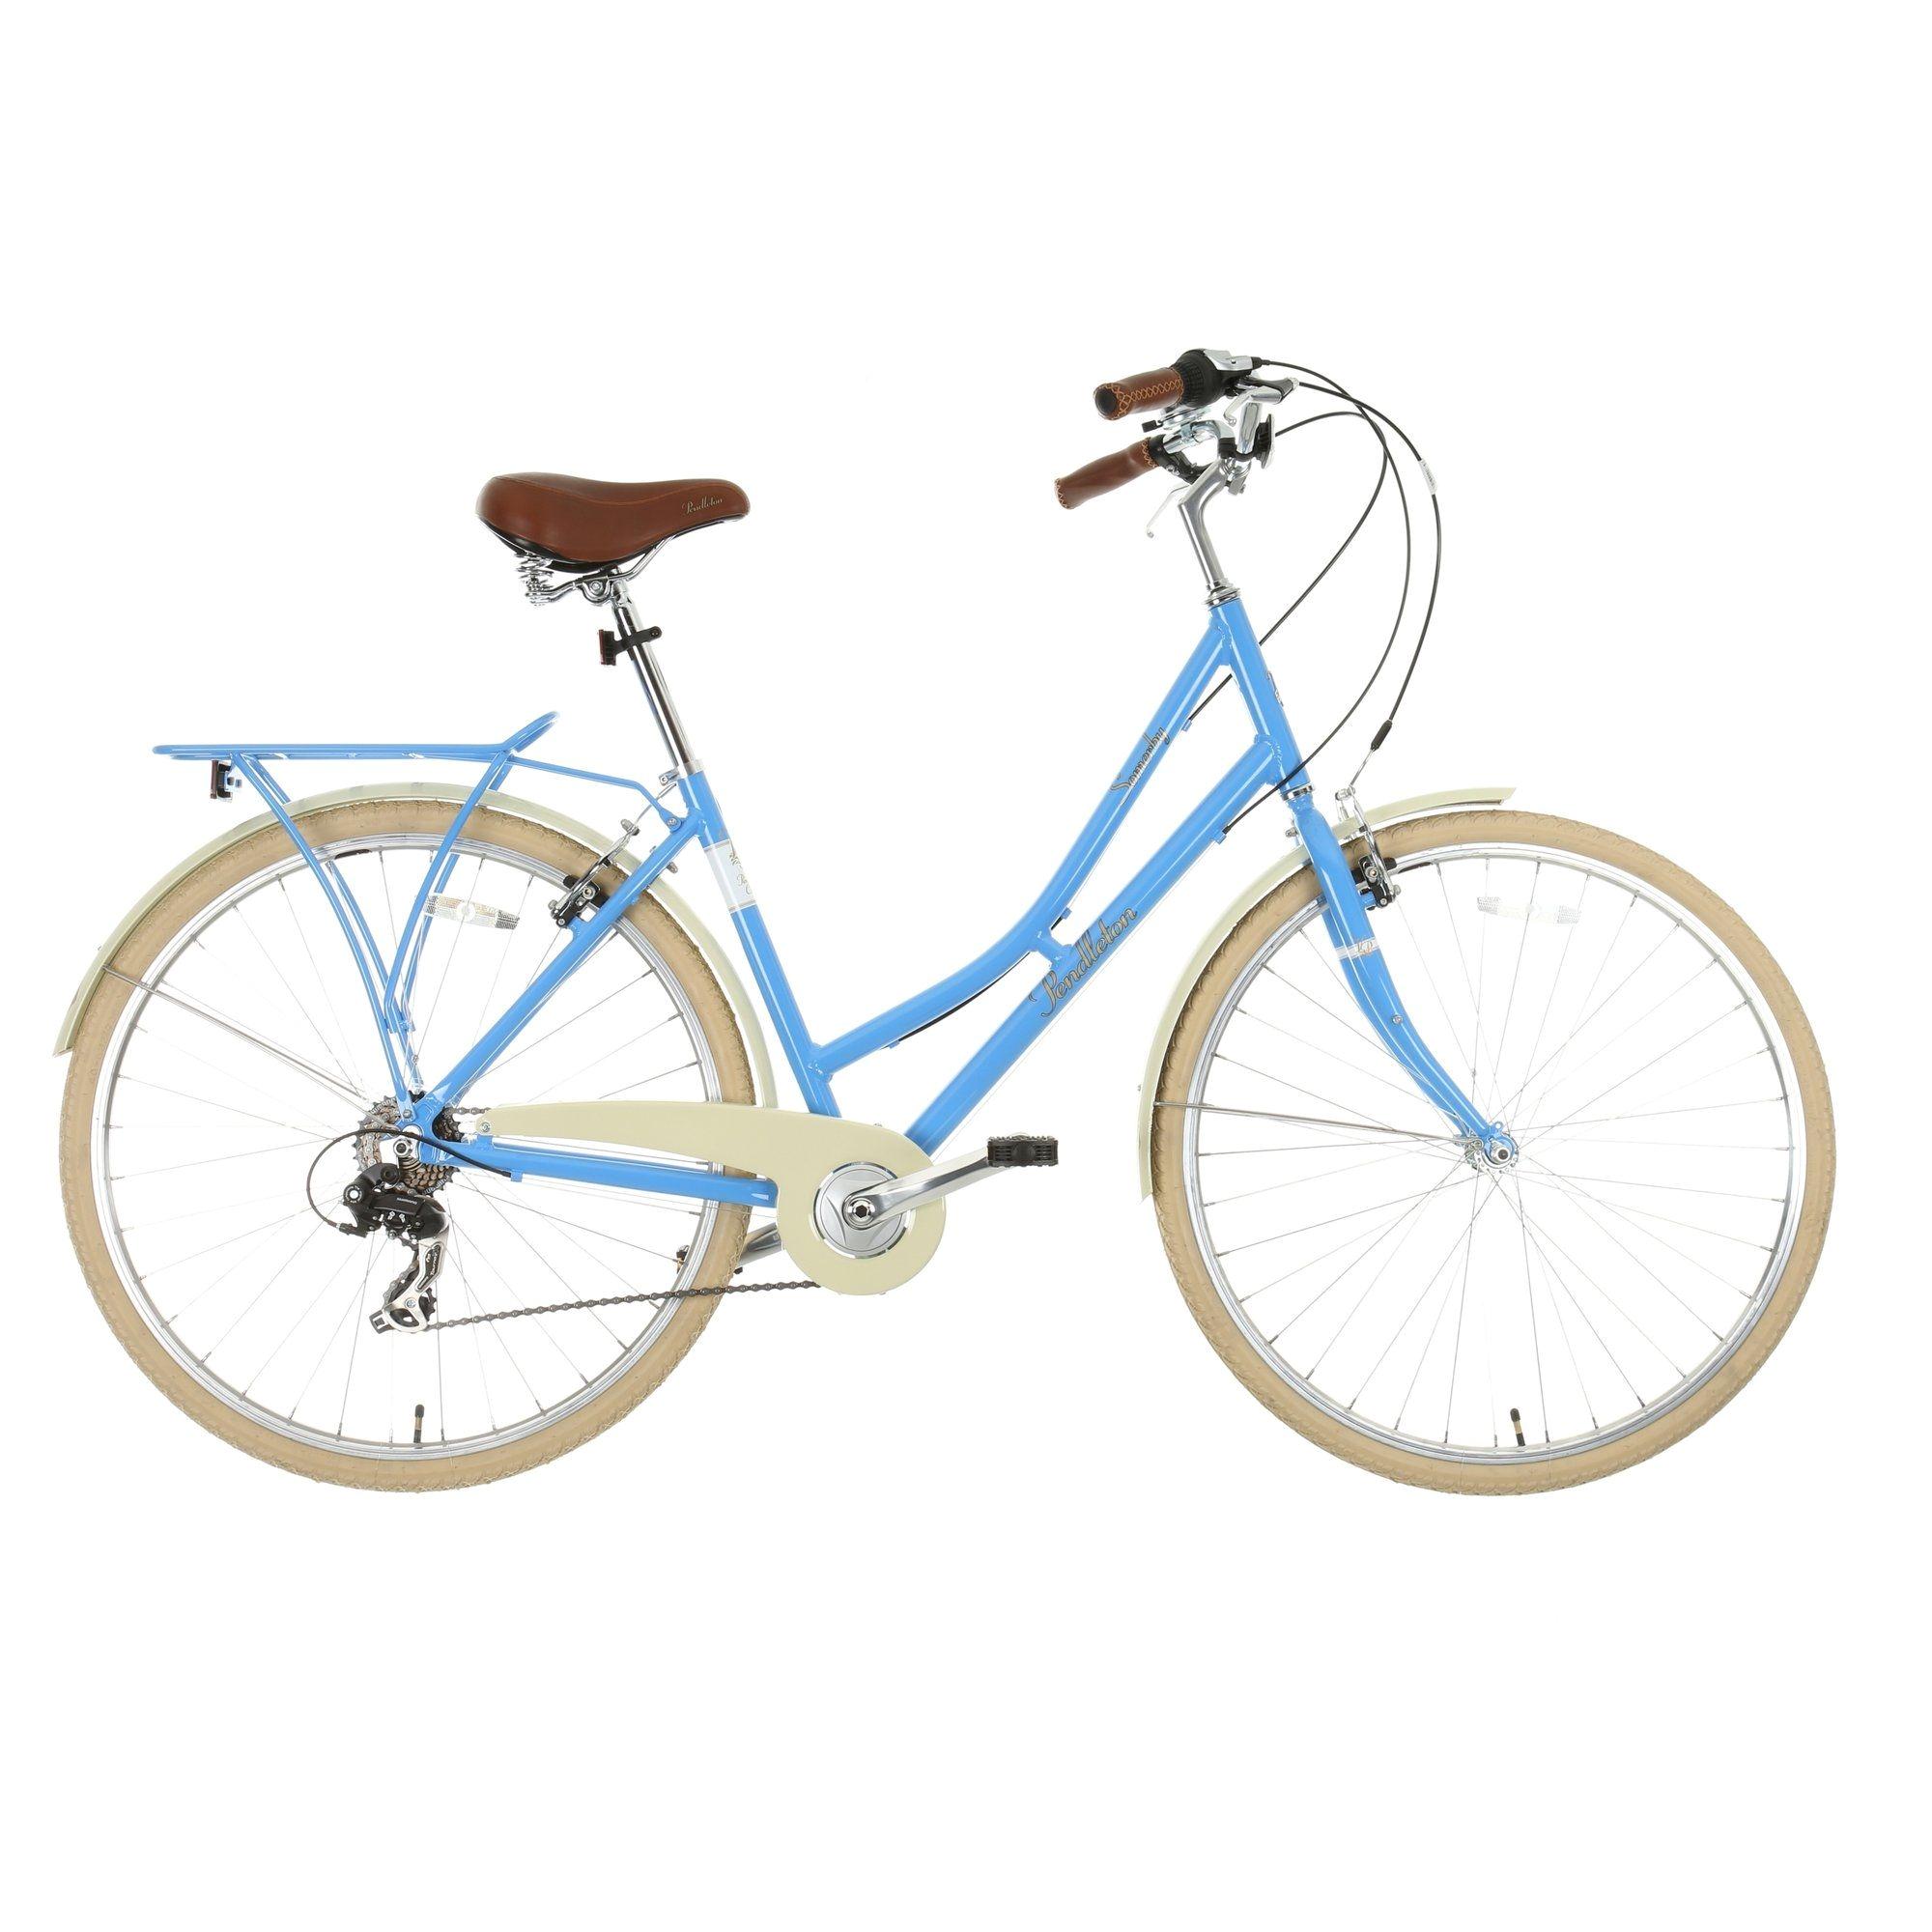 Halfords Bicycle Rack Pendleton Bikes Buyer S Guide Review Tips Hybrid Bikes